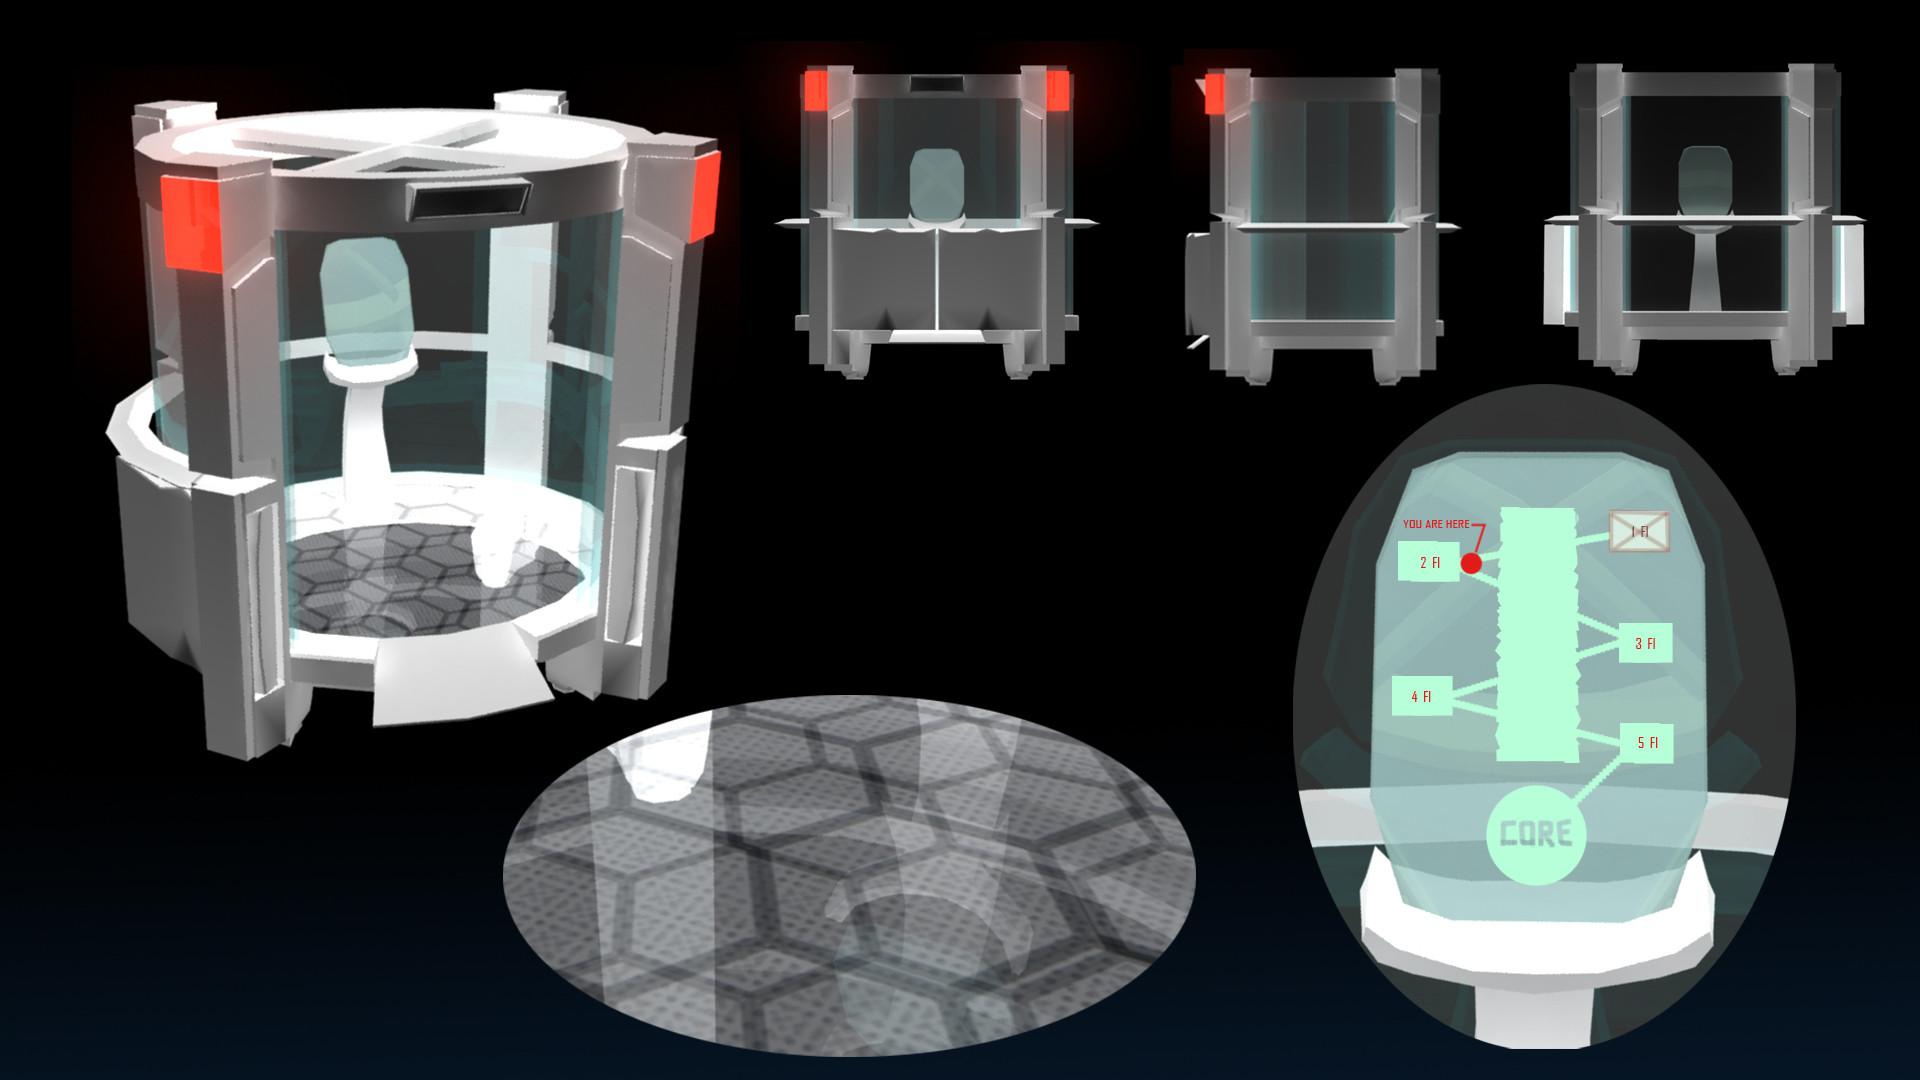 ArtStation - Scifi Elevator, Nina Petchprapa